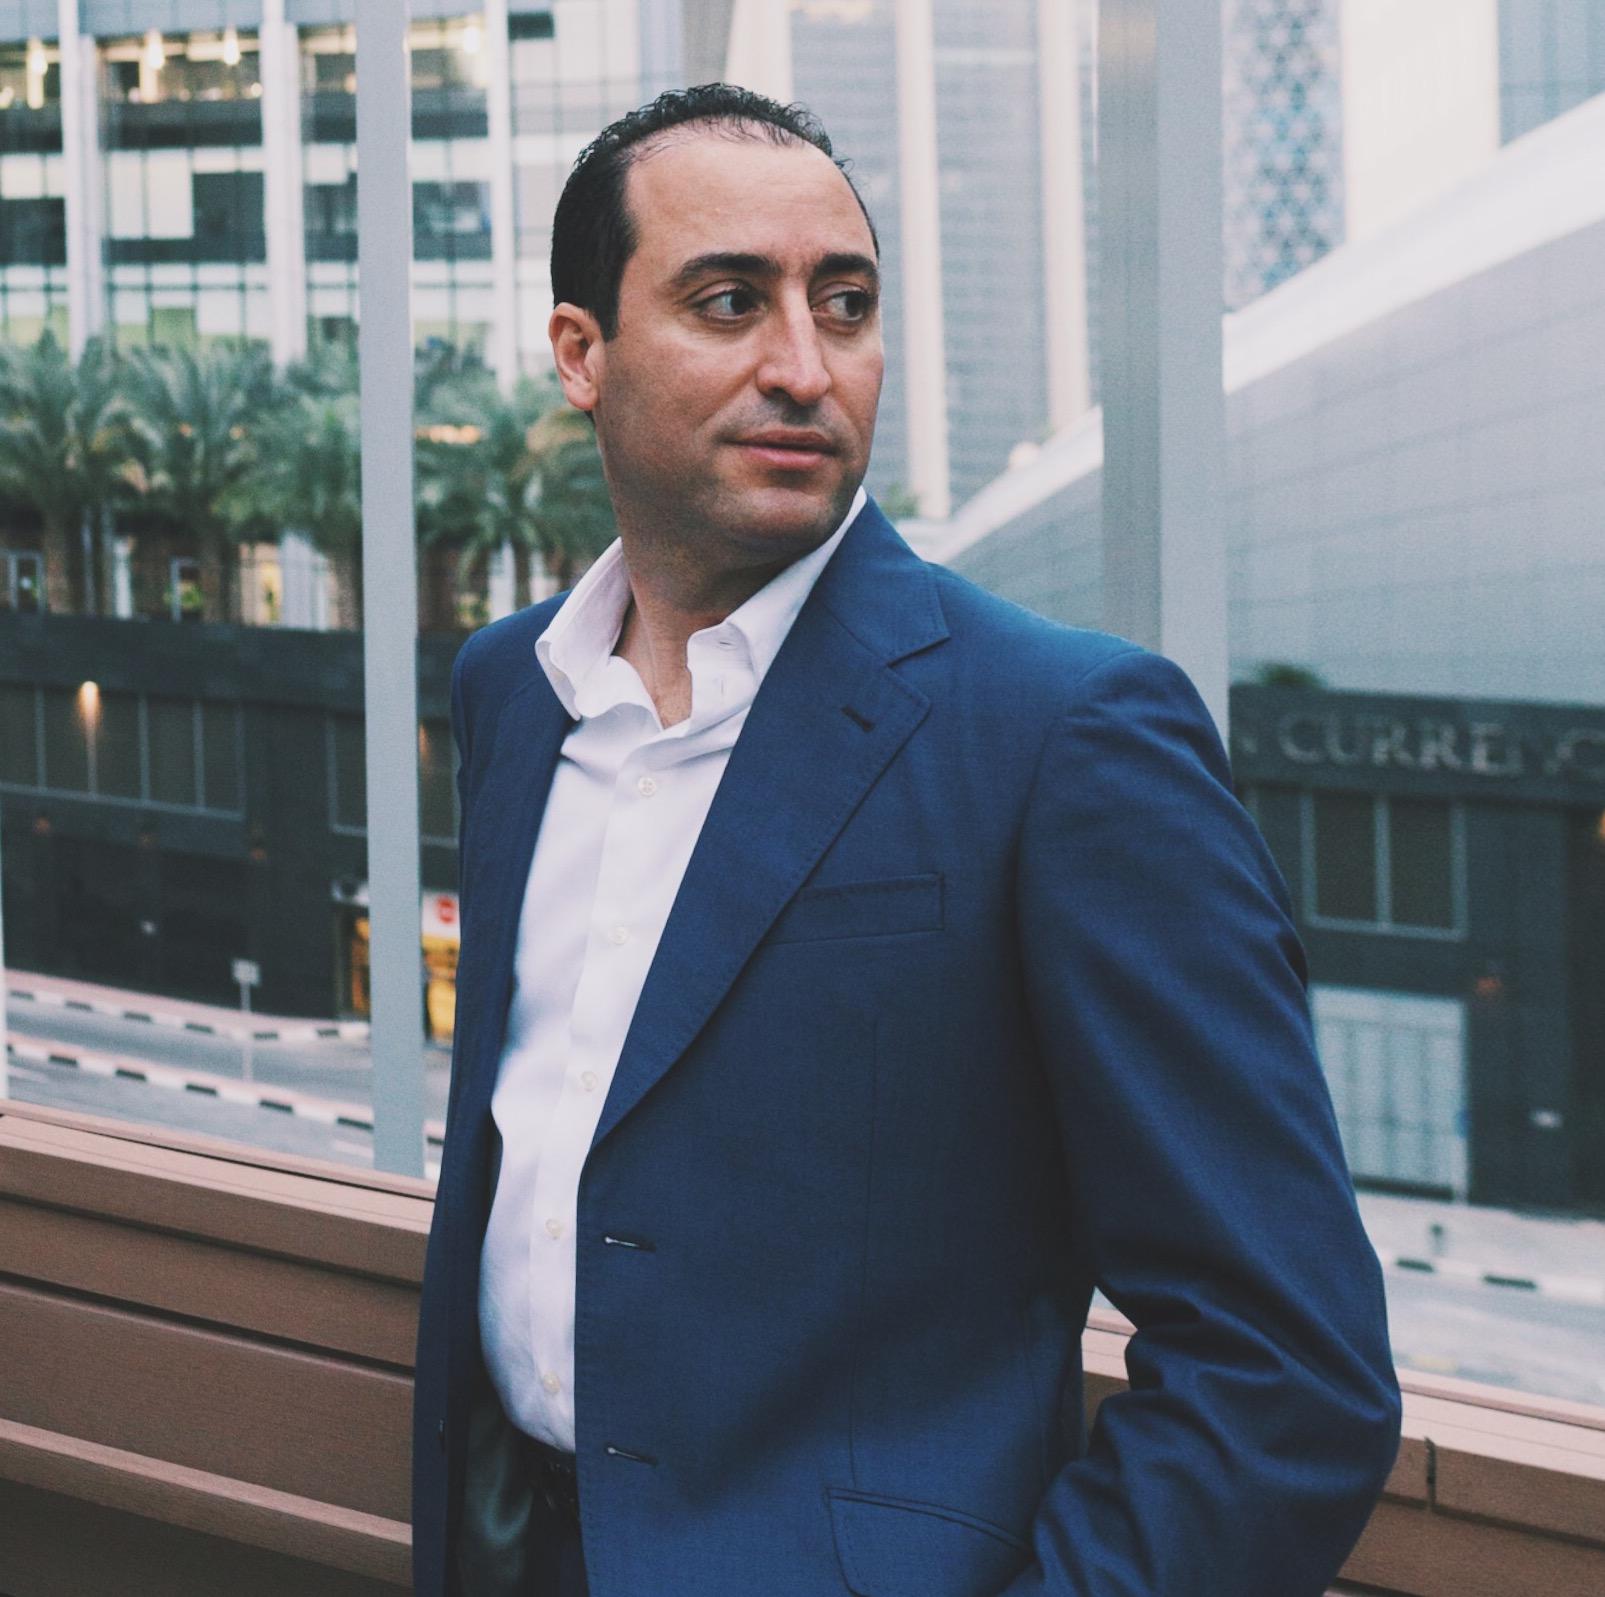 The Jordanian Founder of the World's First Arabic Email Service Talks Entrepreneurship & Blockchain